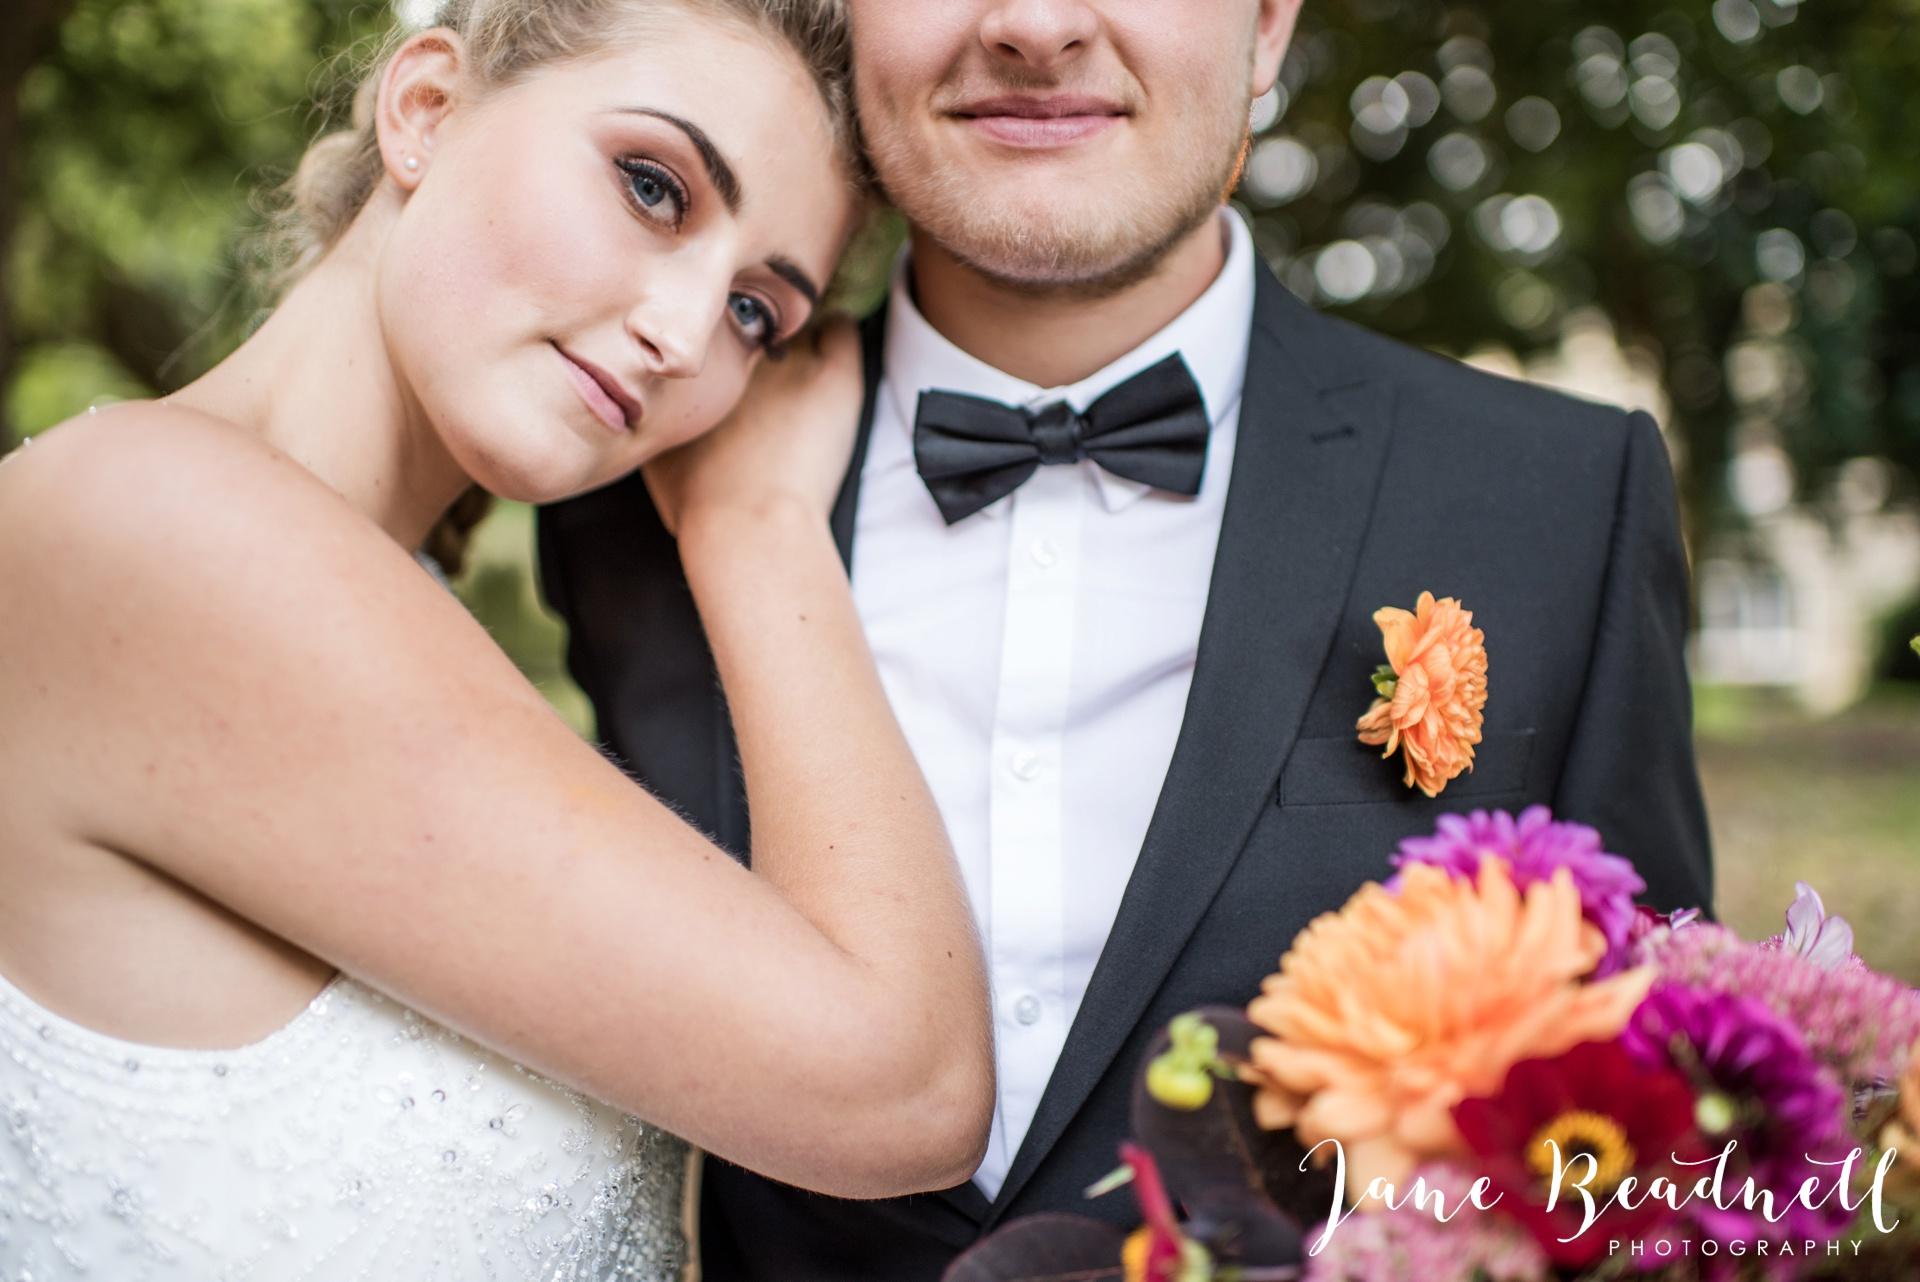 leafy-couture-wedding-flowers-otley-fine-art-wedding-photographer-jane-beadnell-photography_0047